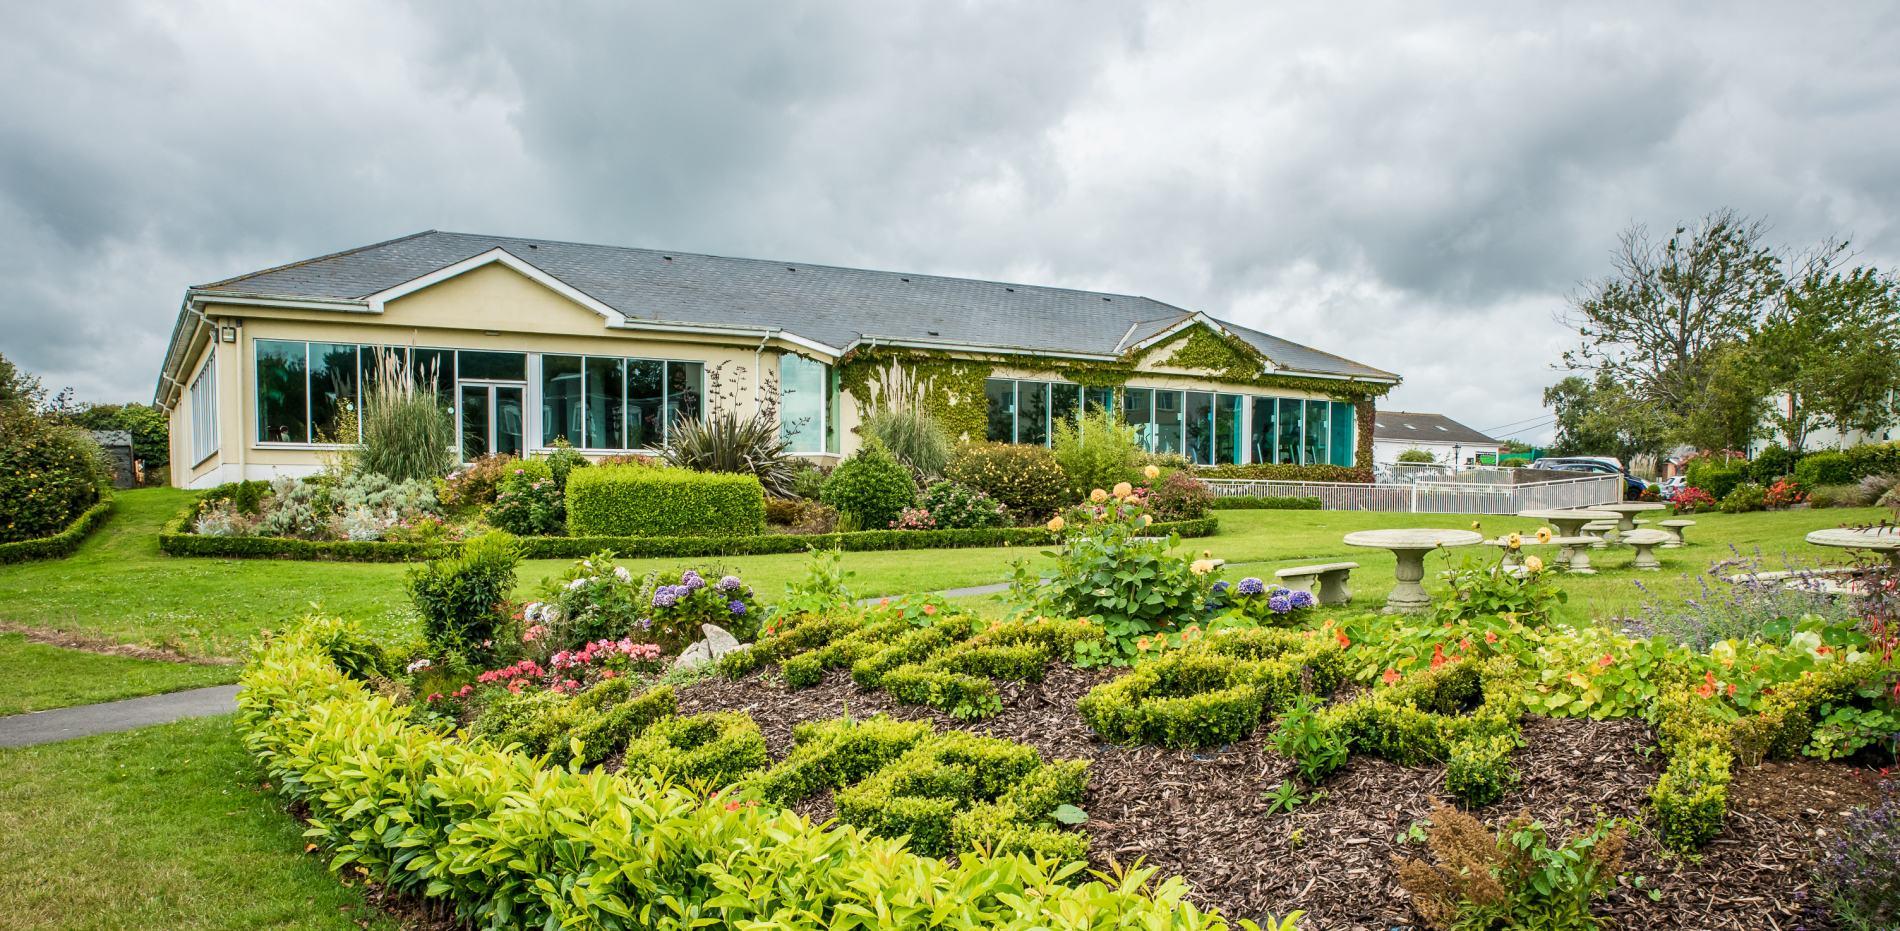 Arklow Bay Hotel Garden Image